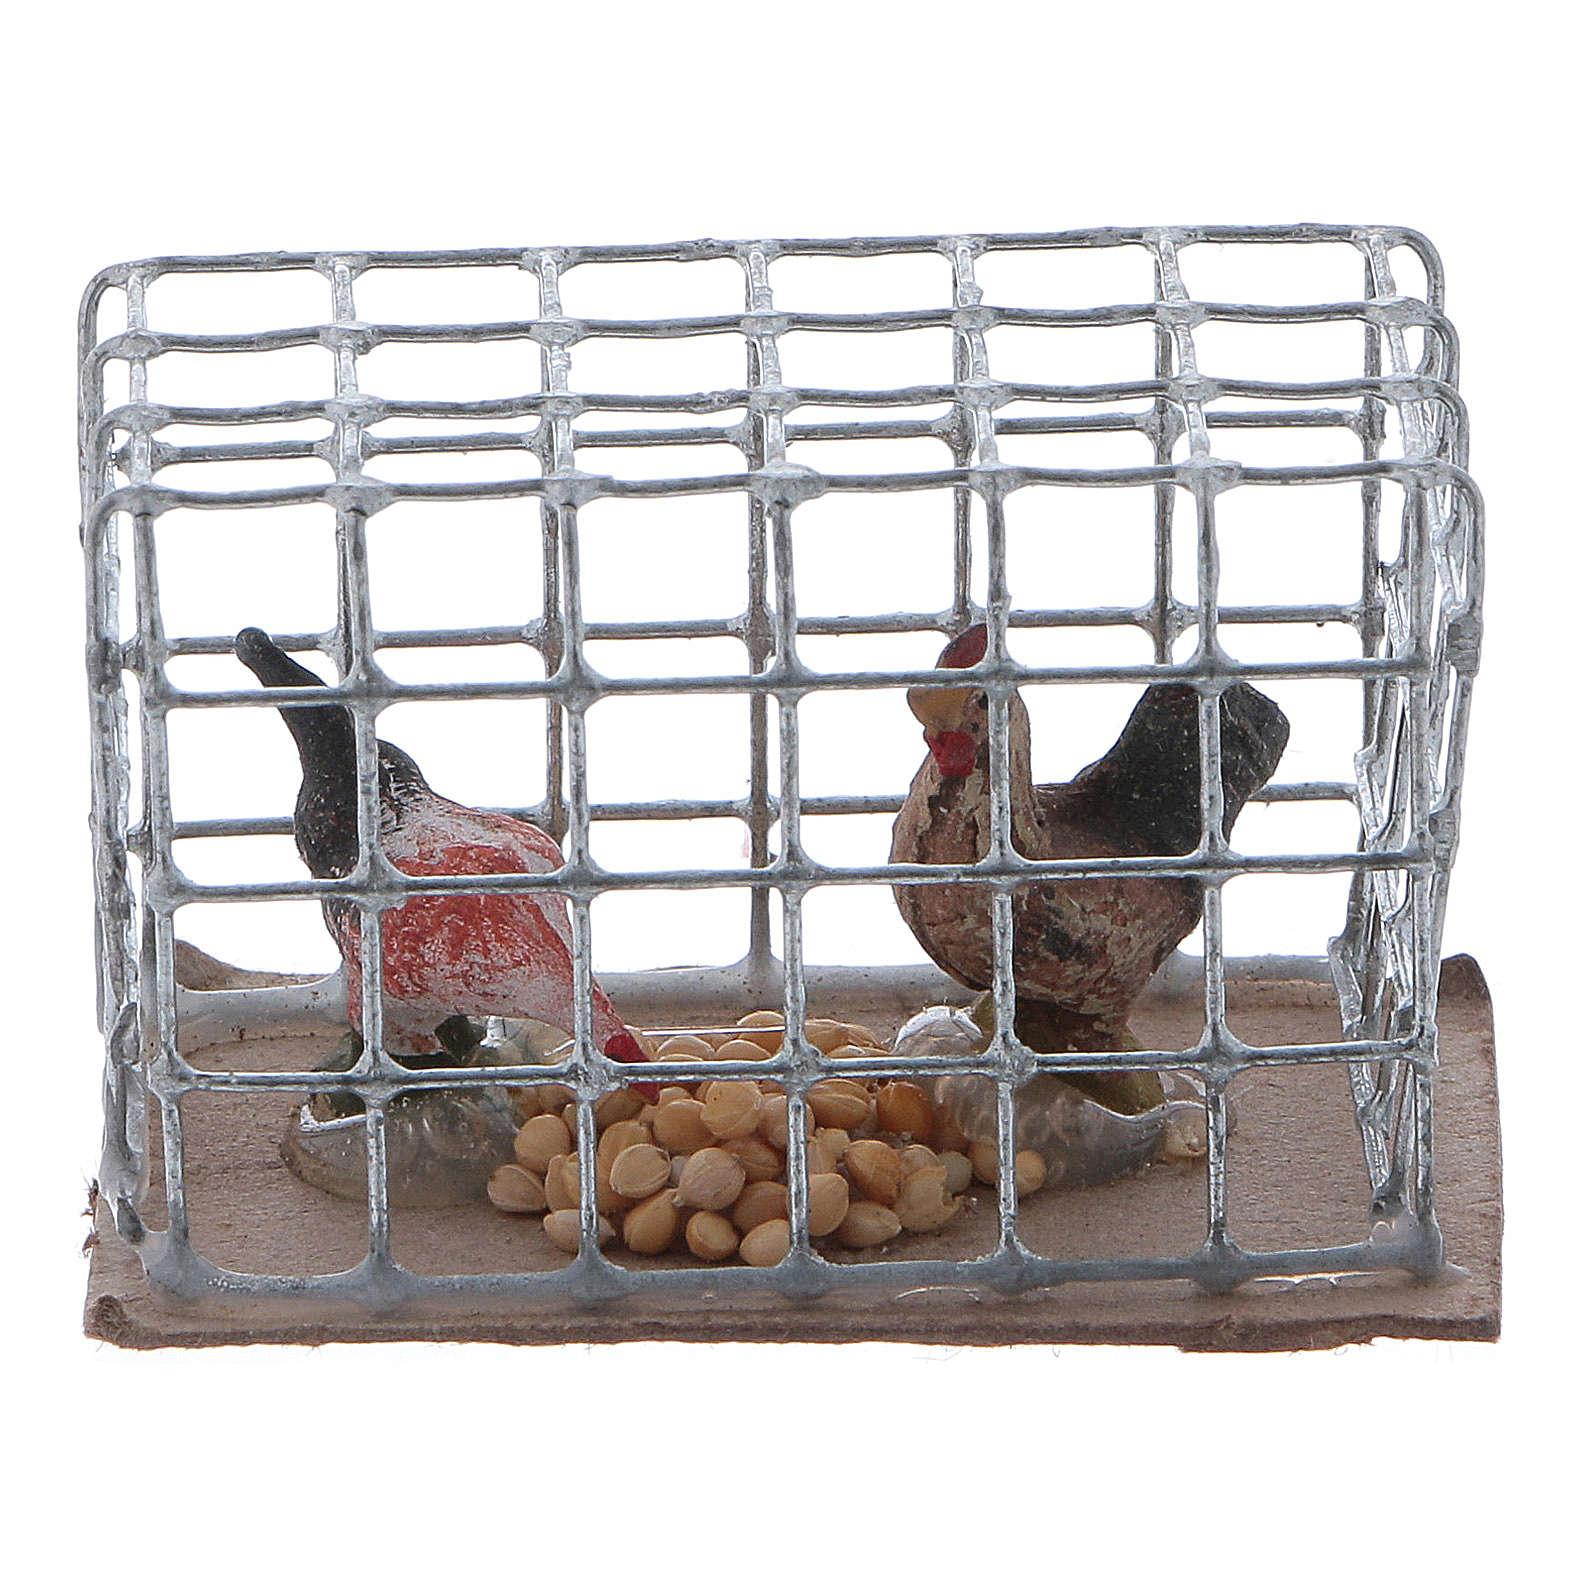 Cage with chickens, Neapolitan nativity scene 4